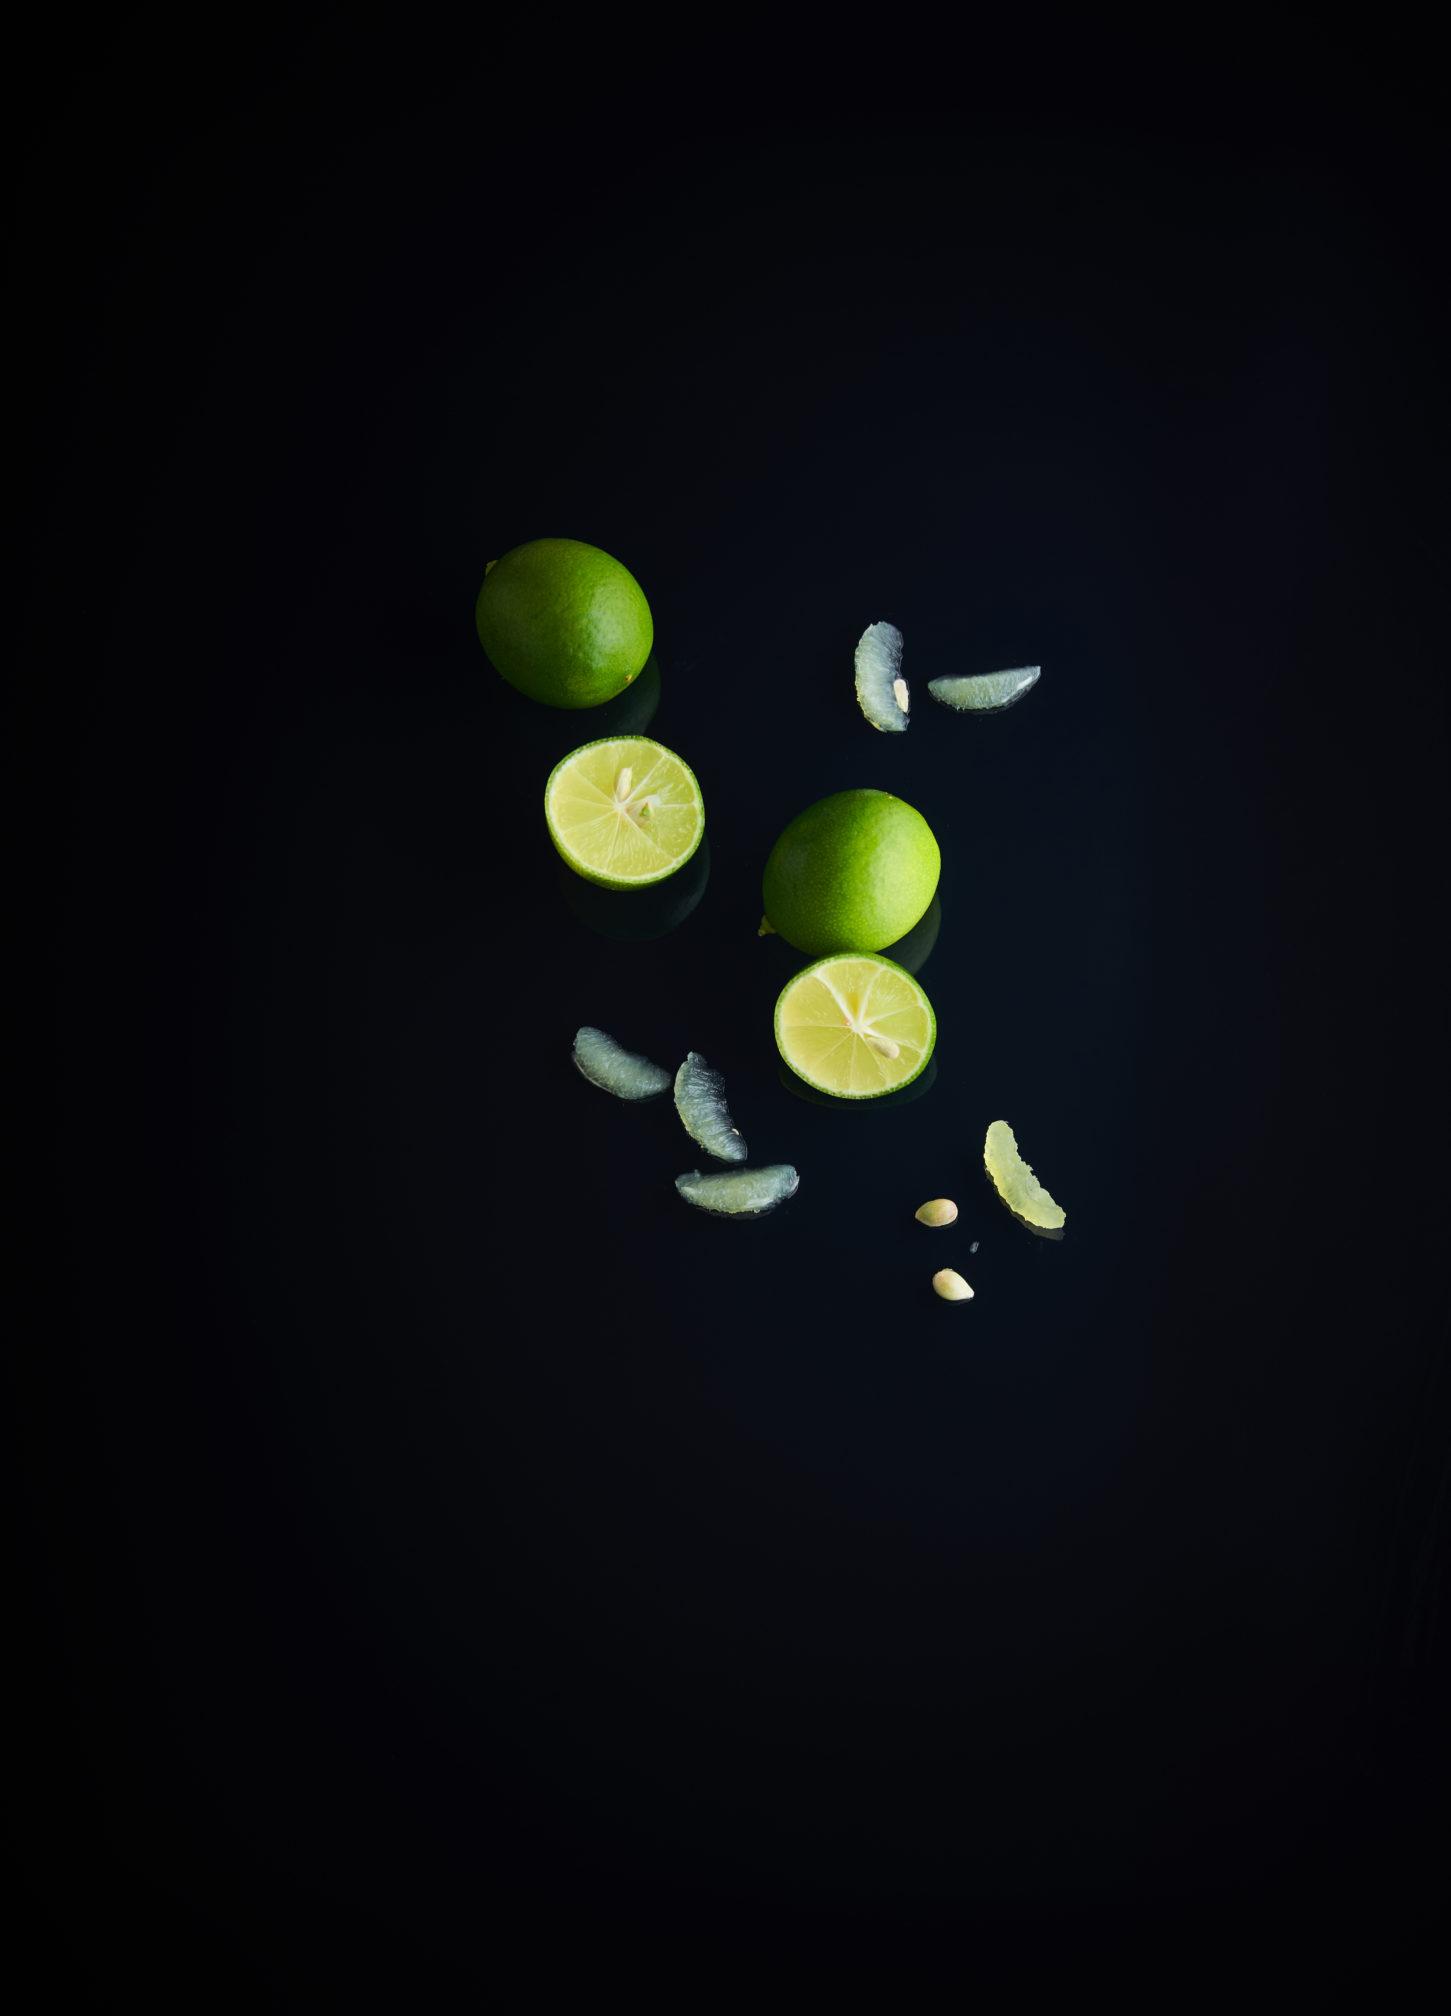 capexo-lilot-fruits-limequat-mini-citron-vert-lime-baby